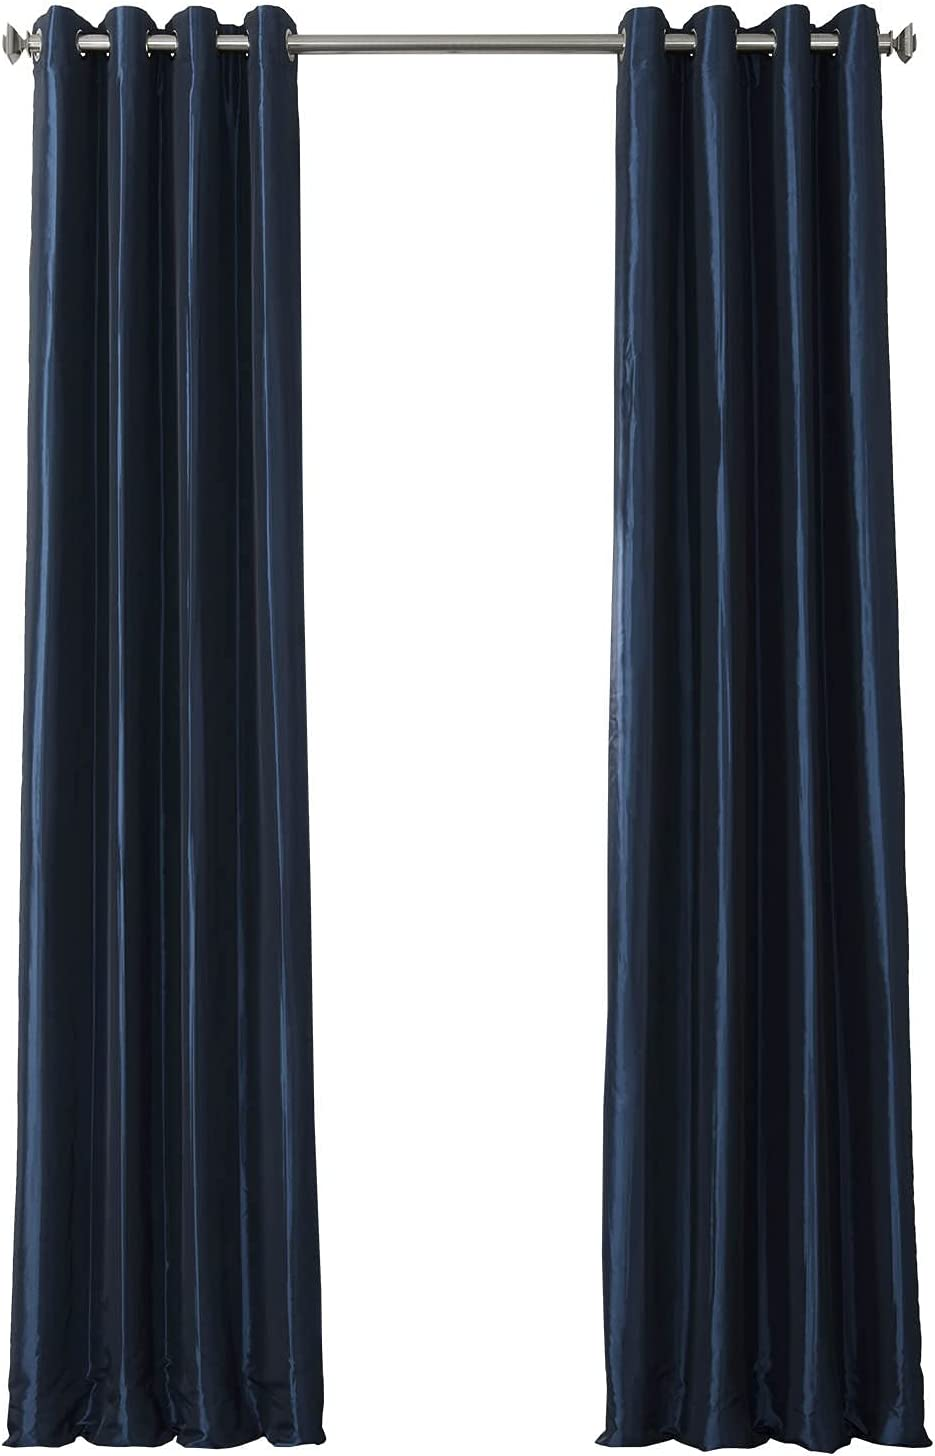 HPD Half Price Drapes Rapid rise Grommet Faux Nashville-Davidson Mall PTCH-BO194010-108-GR Blackout